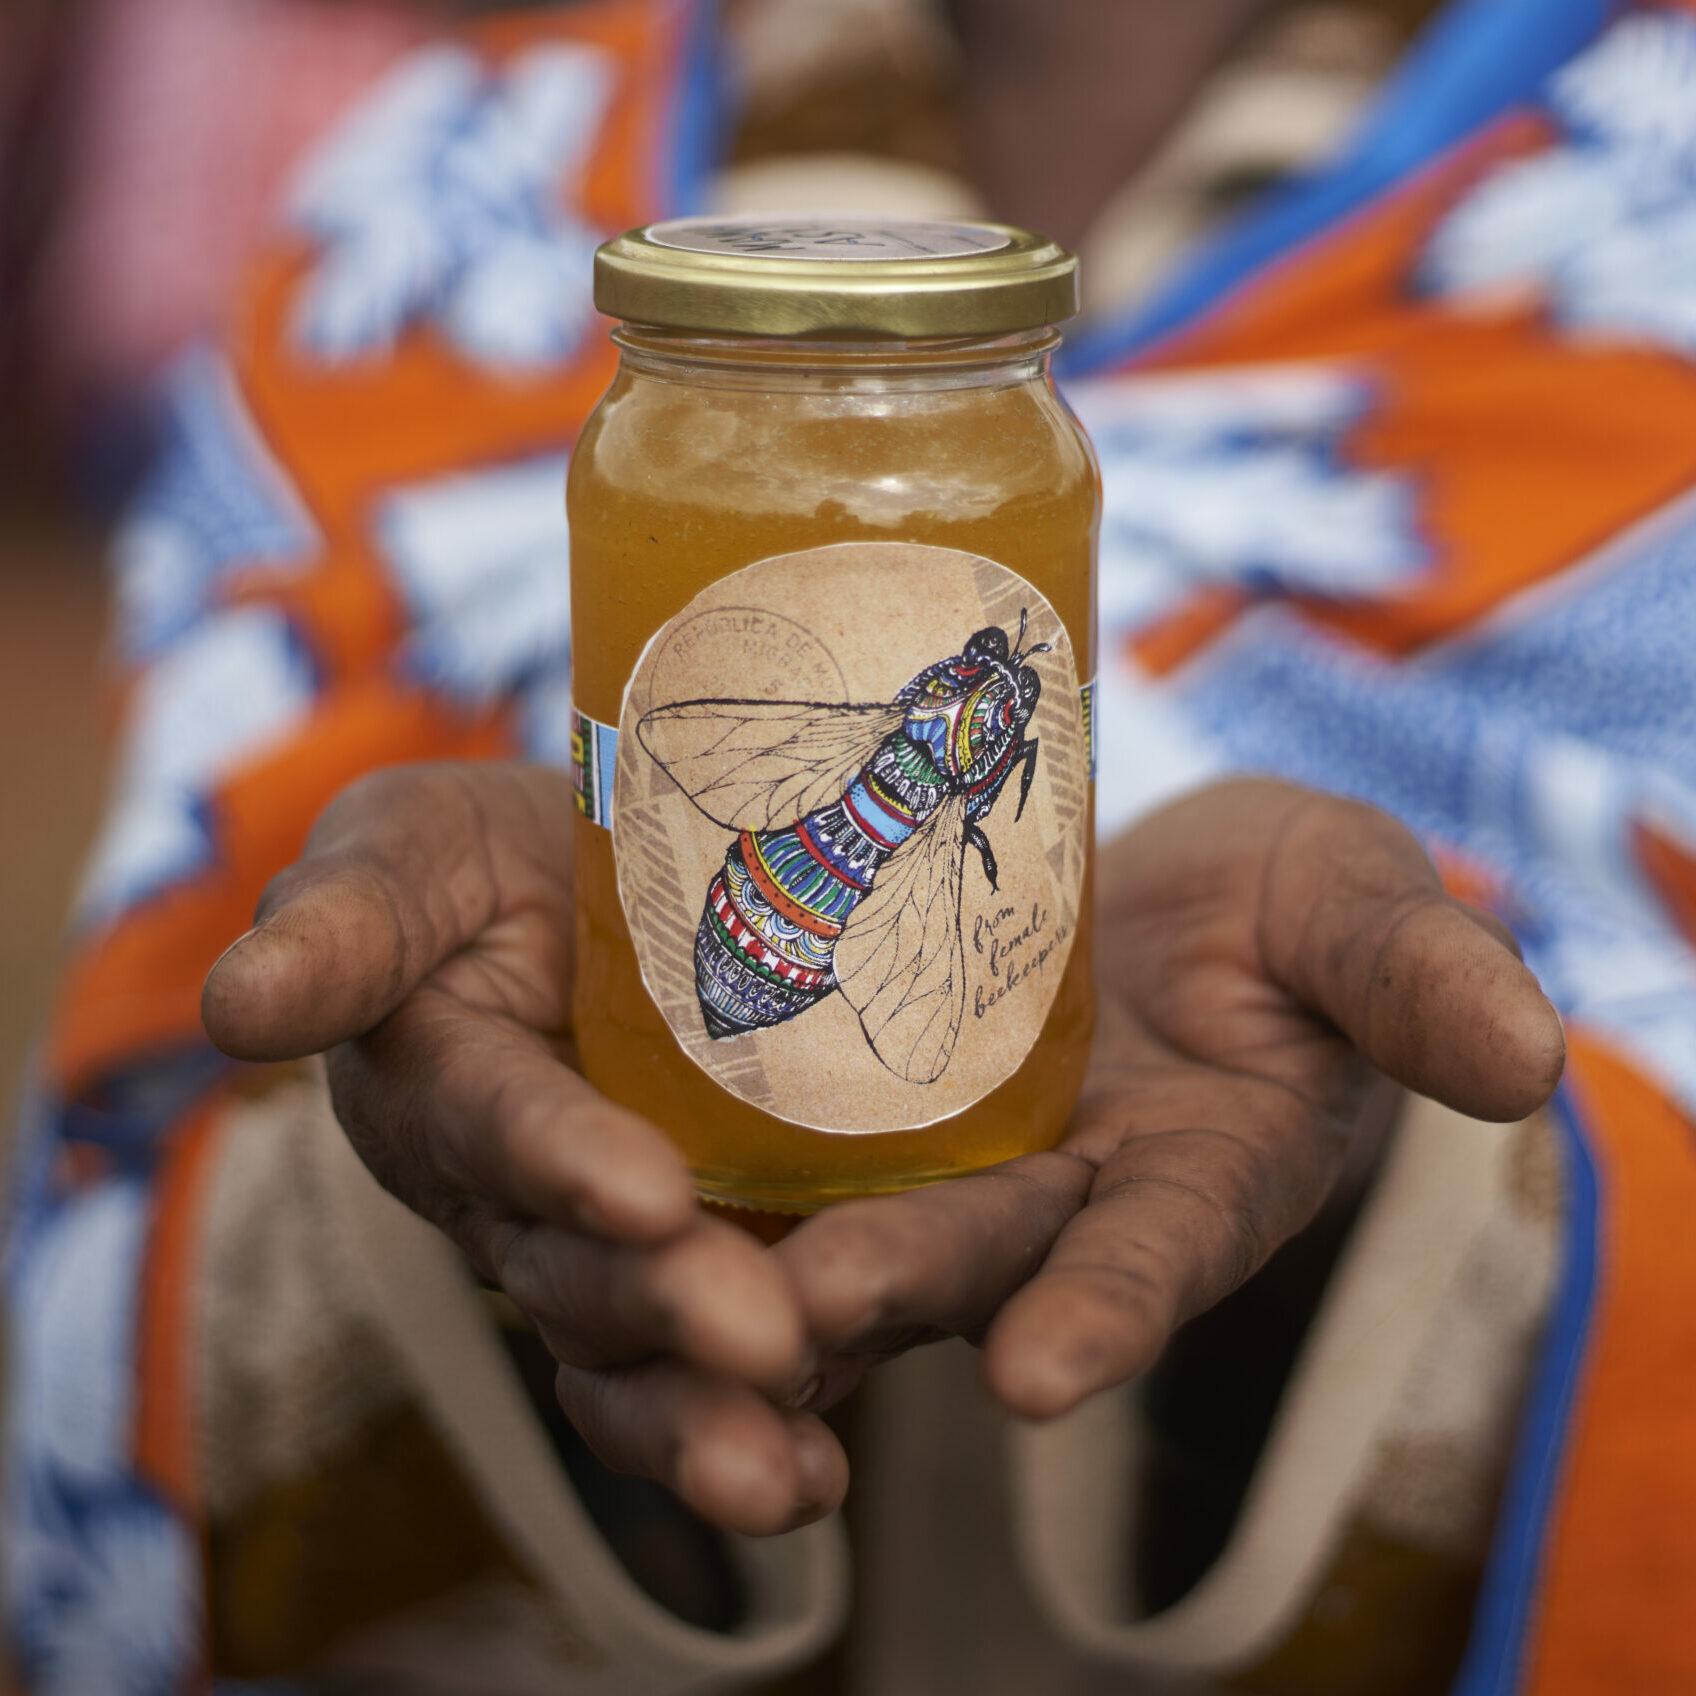 A jar of Mama Asali honey from Tanzania